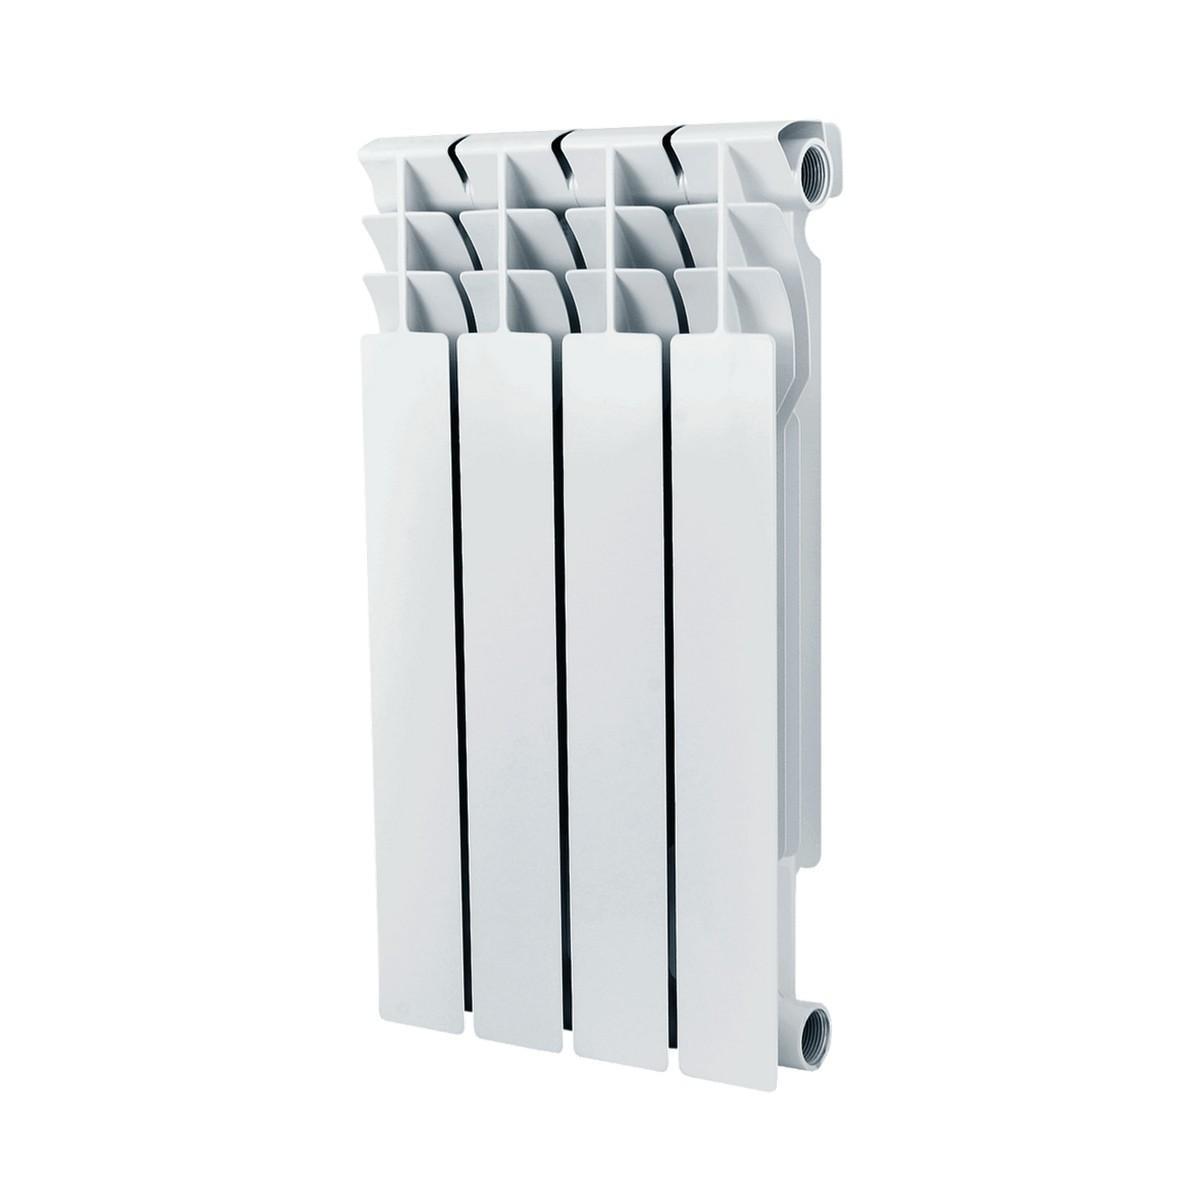 Радиатор биметалл Ultra Plus 500 5 секций Ogint  117-5973